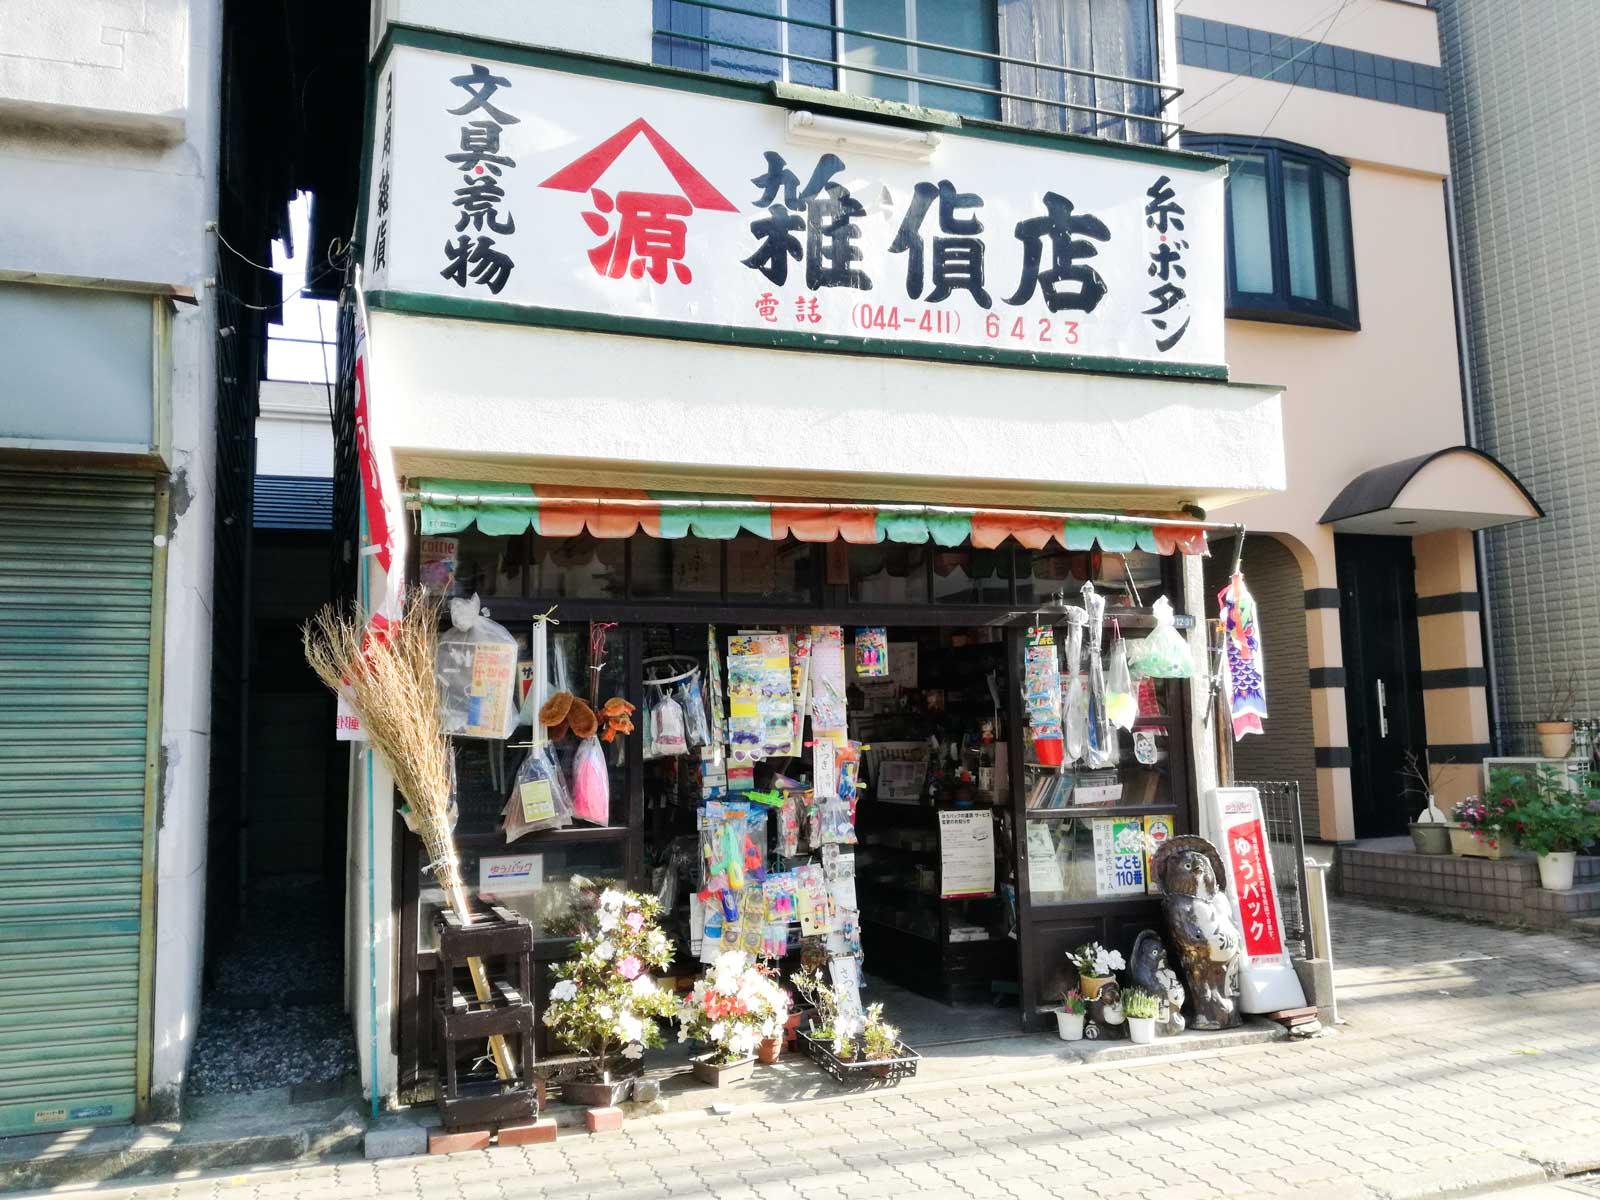 昭和時代の雑貨店